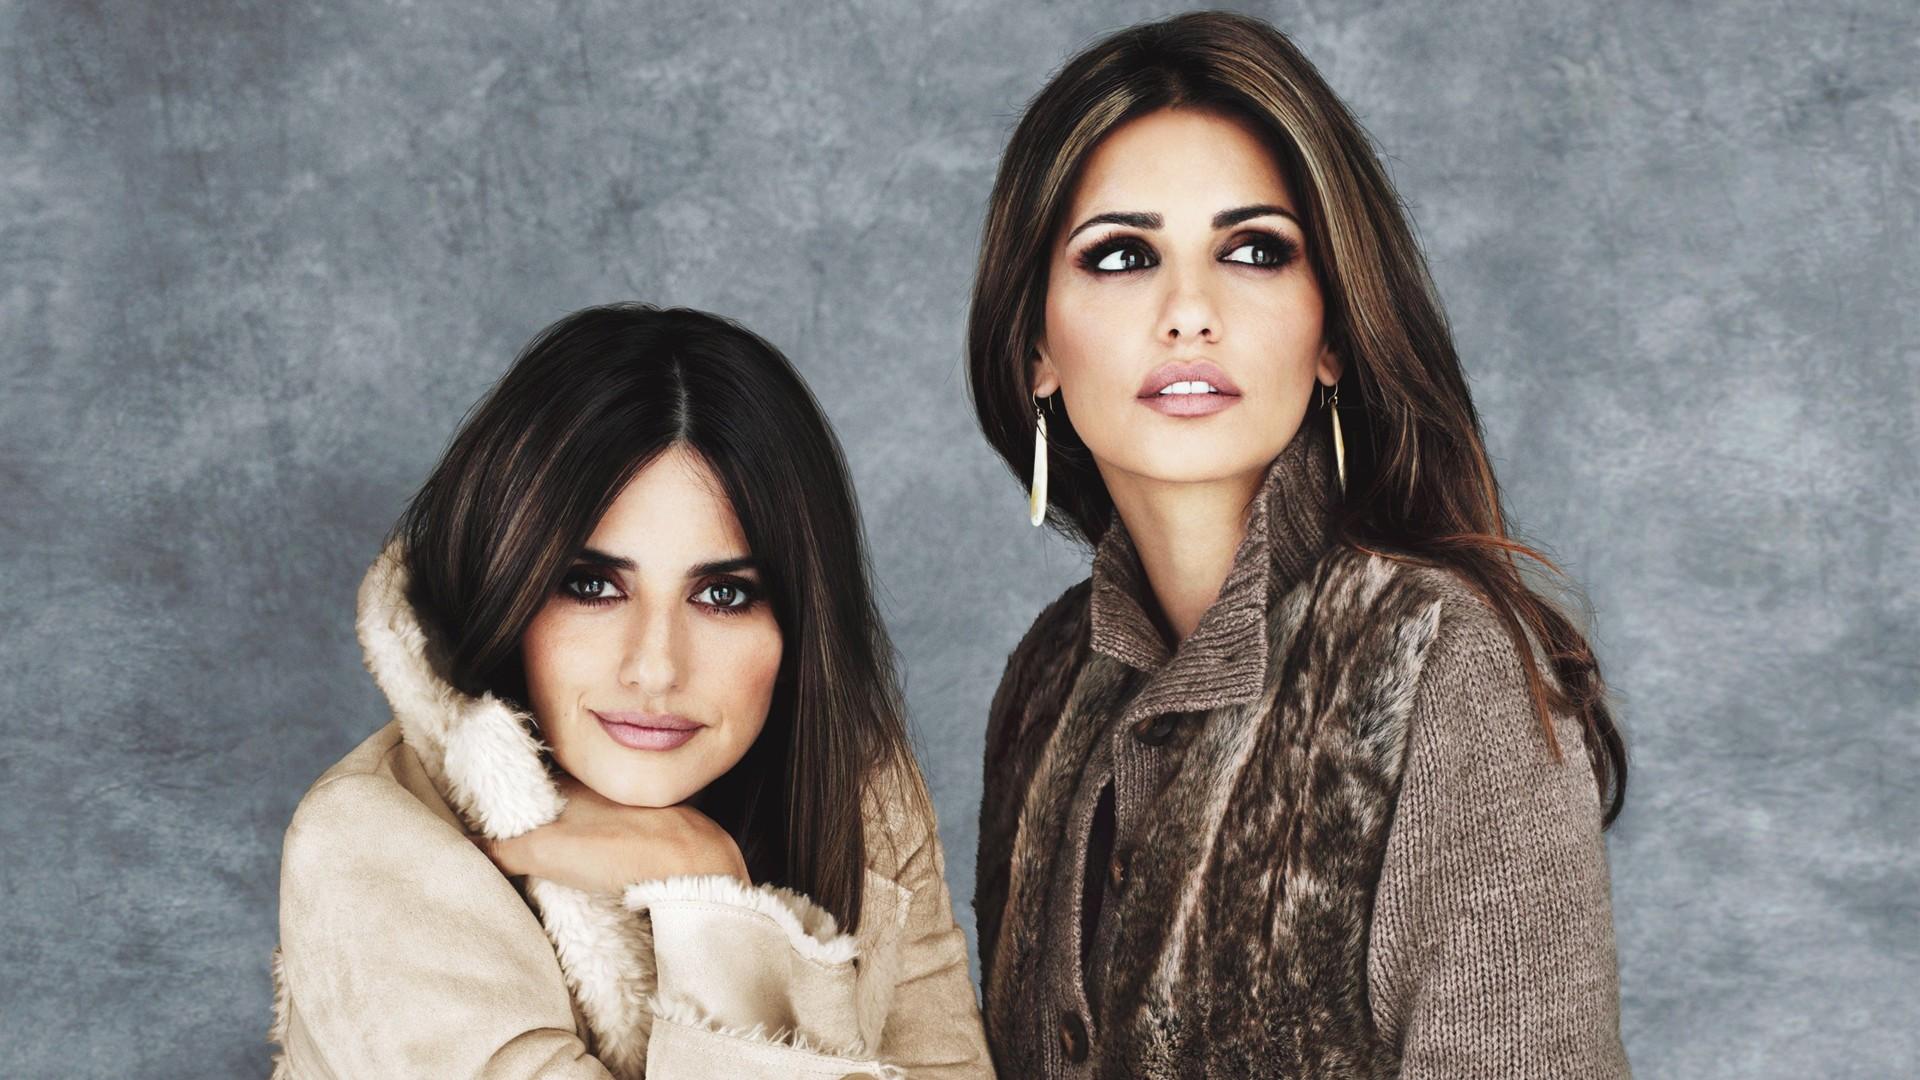 People 1920x1080 women model brunette long hair Monica Cruz actress Penelope Cruz sisters coats sweater brown eyes earring simple background two women